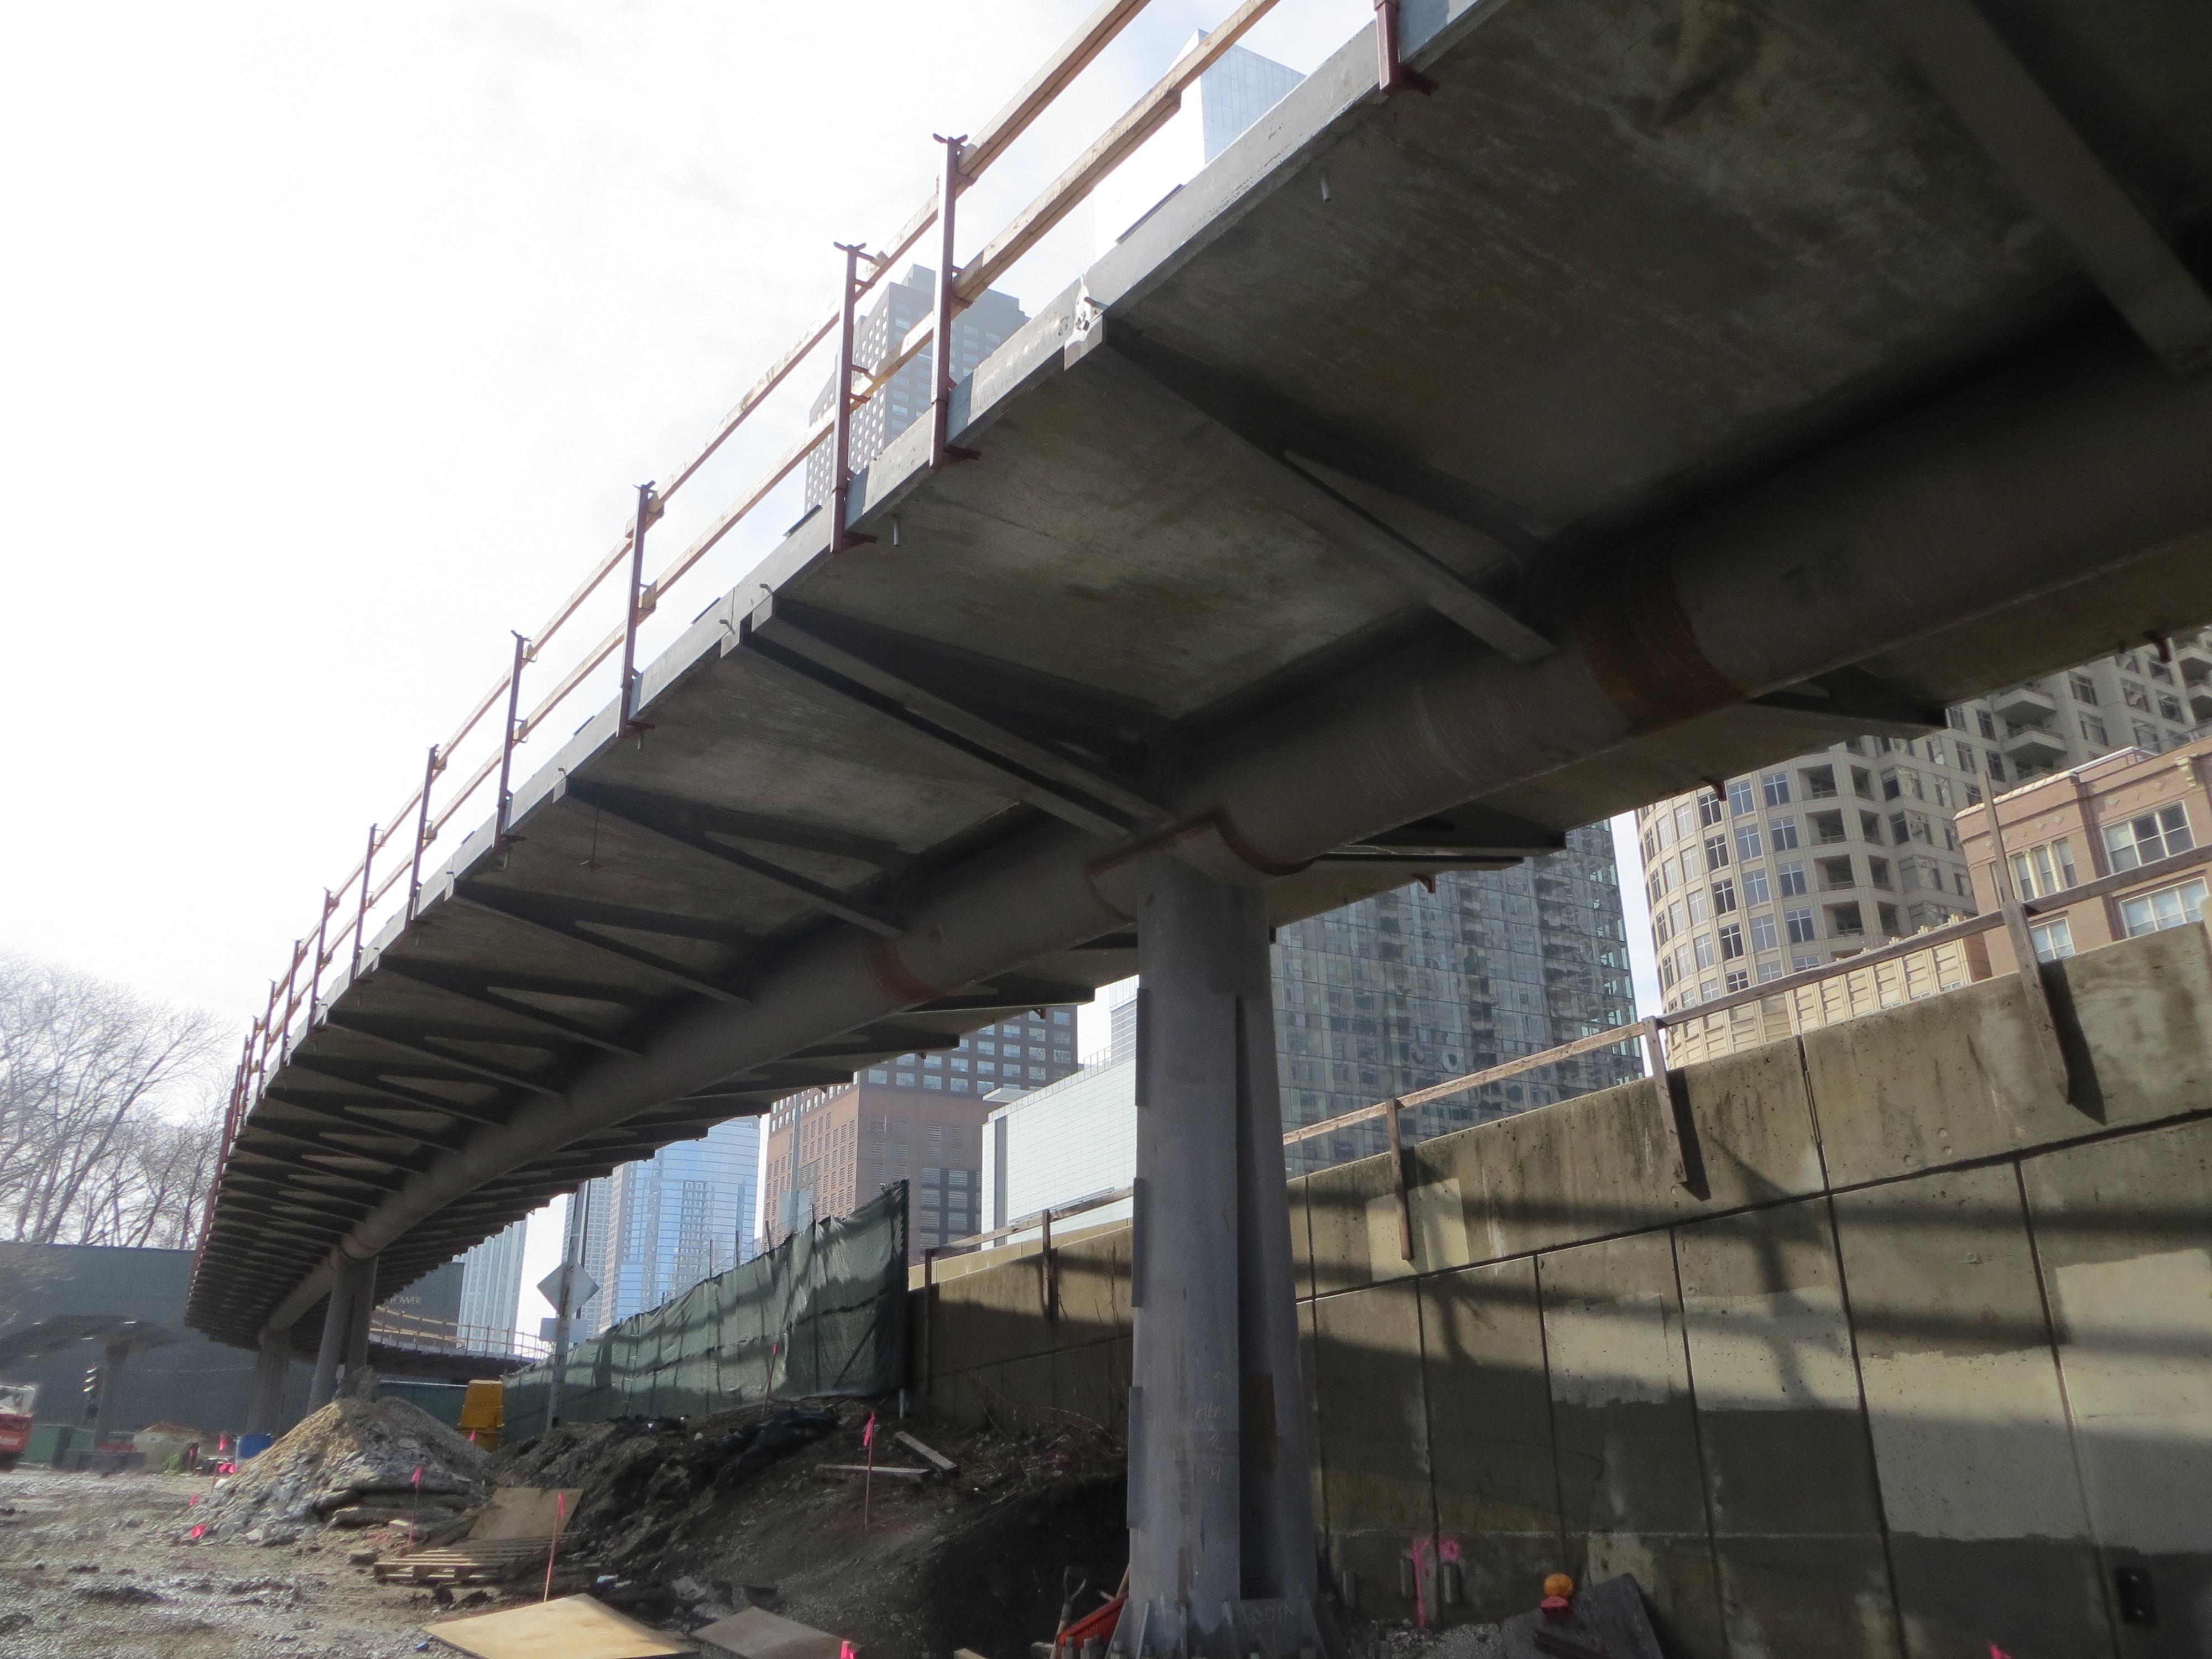 brooklyn bridge new york city free image | Peakpx